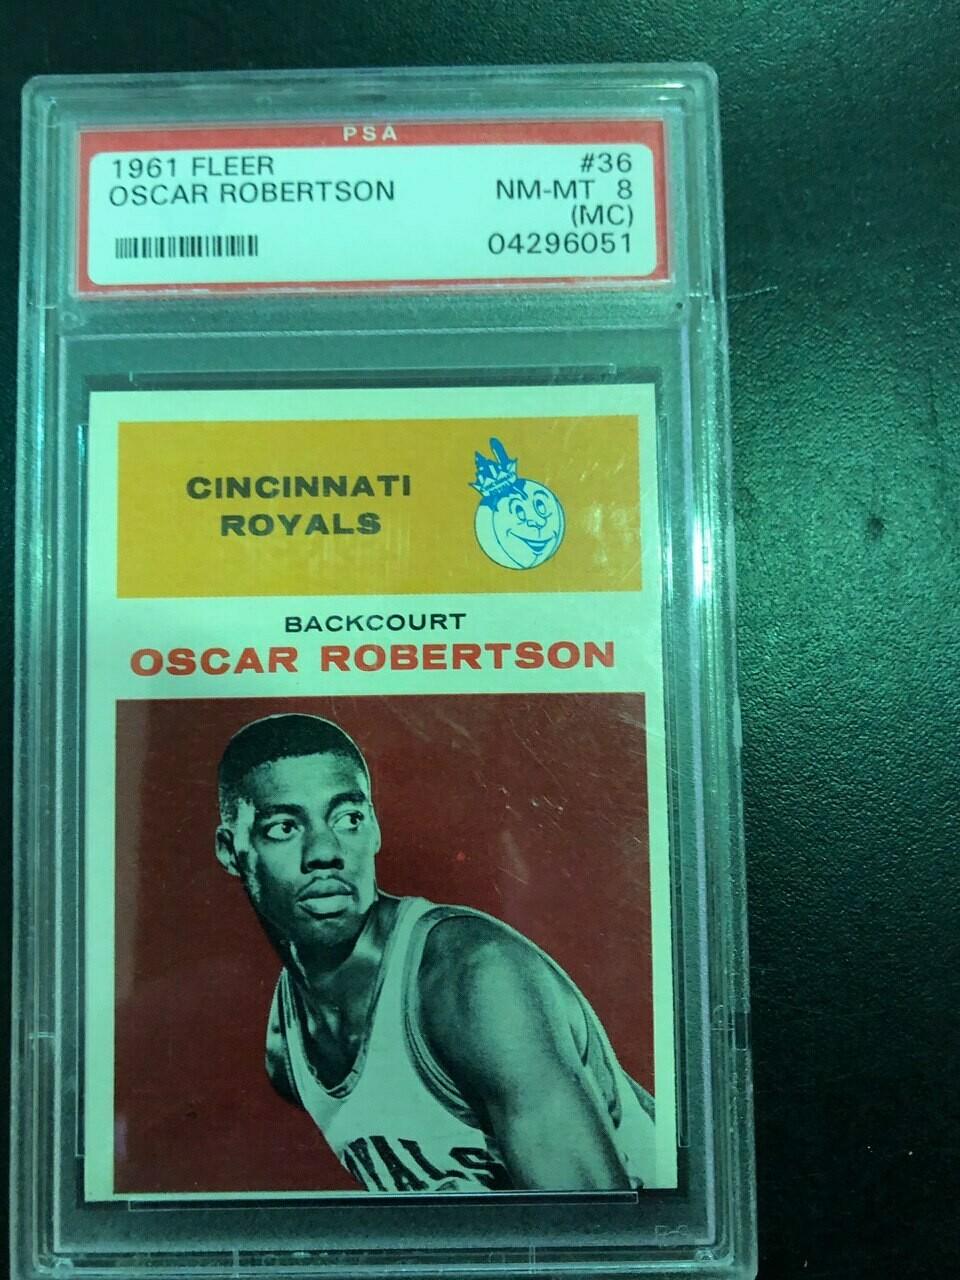 1961/62 Fleer #36 Oscar Robertson rookie, PSA graded 8oc, $895